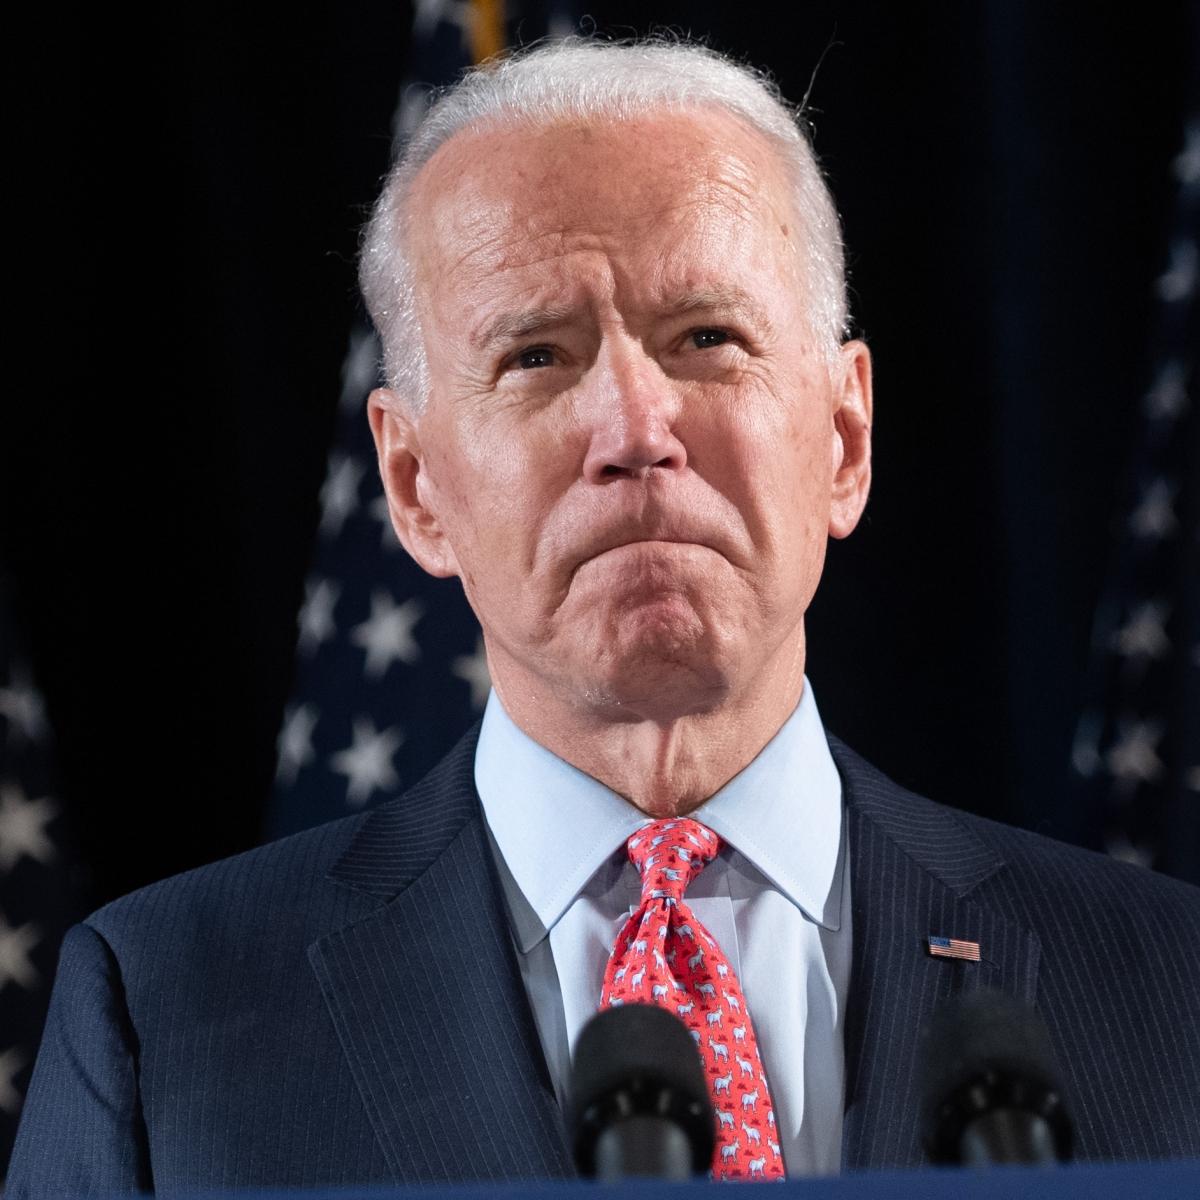 Joe Biden accepts Democratic Party's presidential nomination, vows to end 'season of darkness'